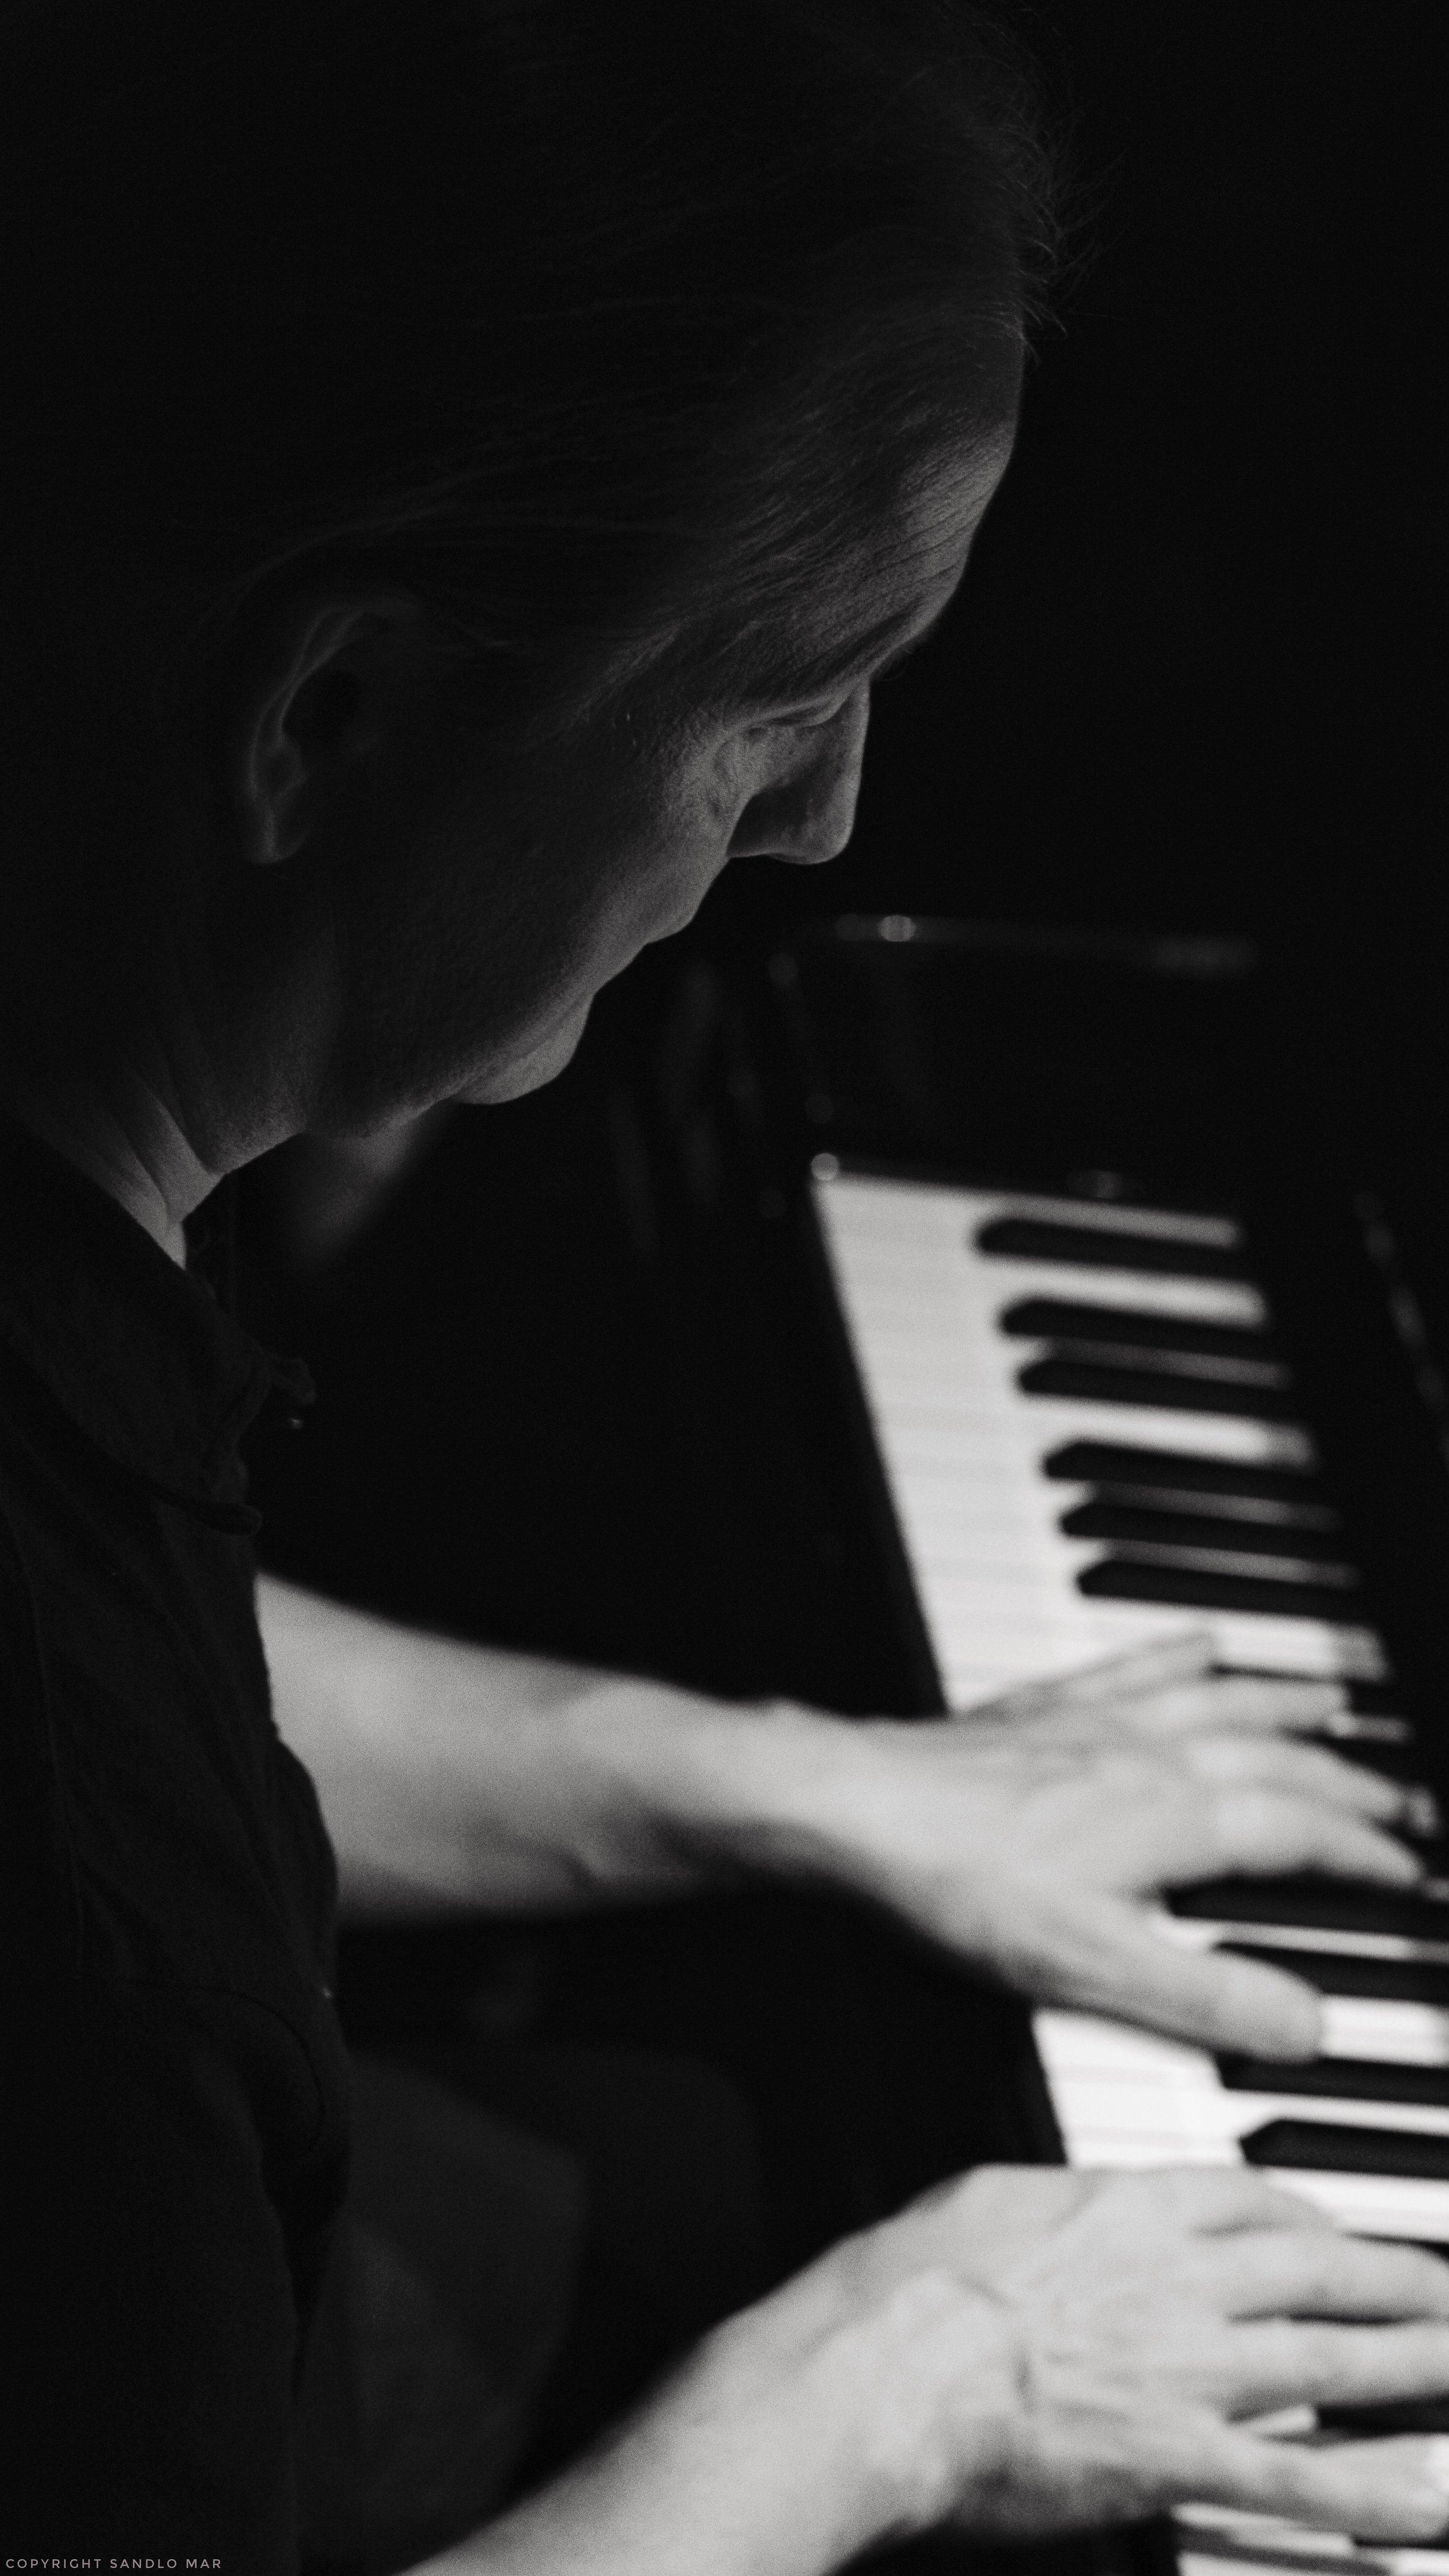 Markus Kitts on the piano.